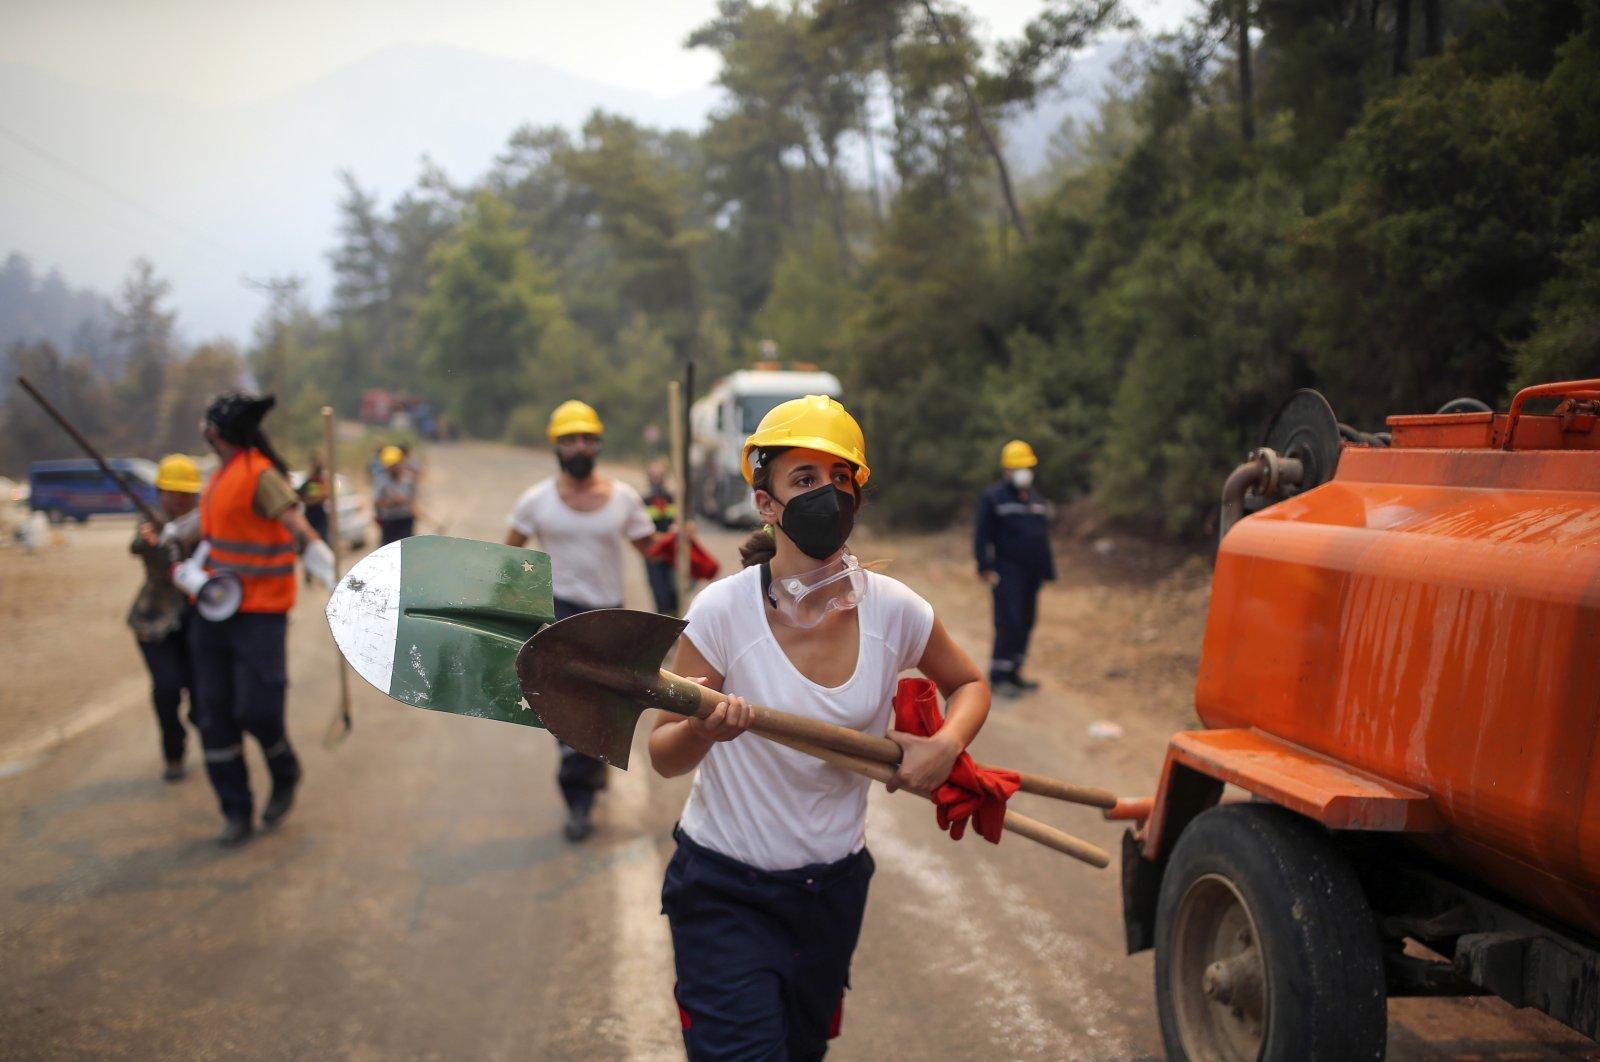 Volunteers run as they fight wildfires in Turgut village, near tourist resort of Marmaris, in Muğla, southwestern Turkey, Aug. 4, 2021. (AP PHOTO)